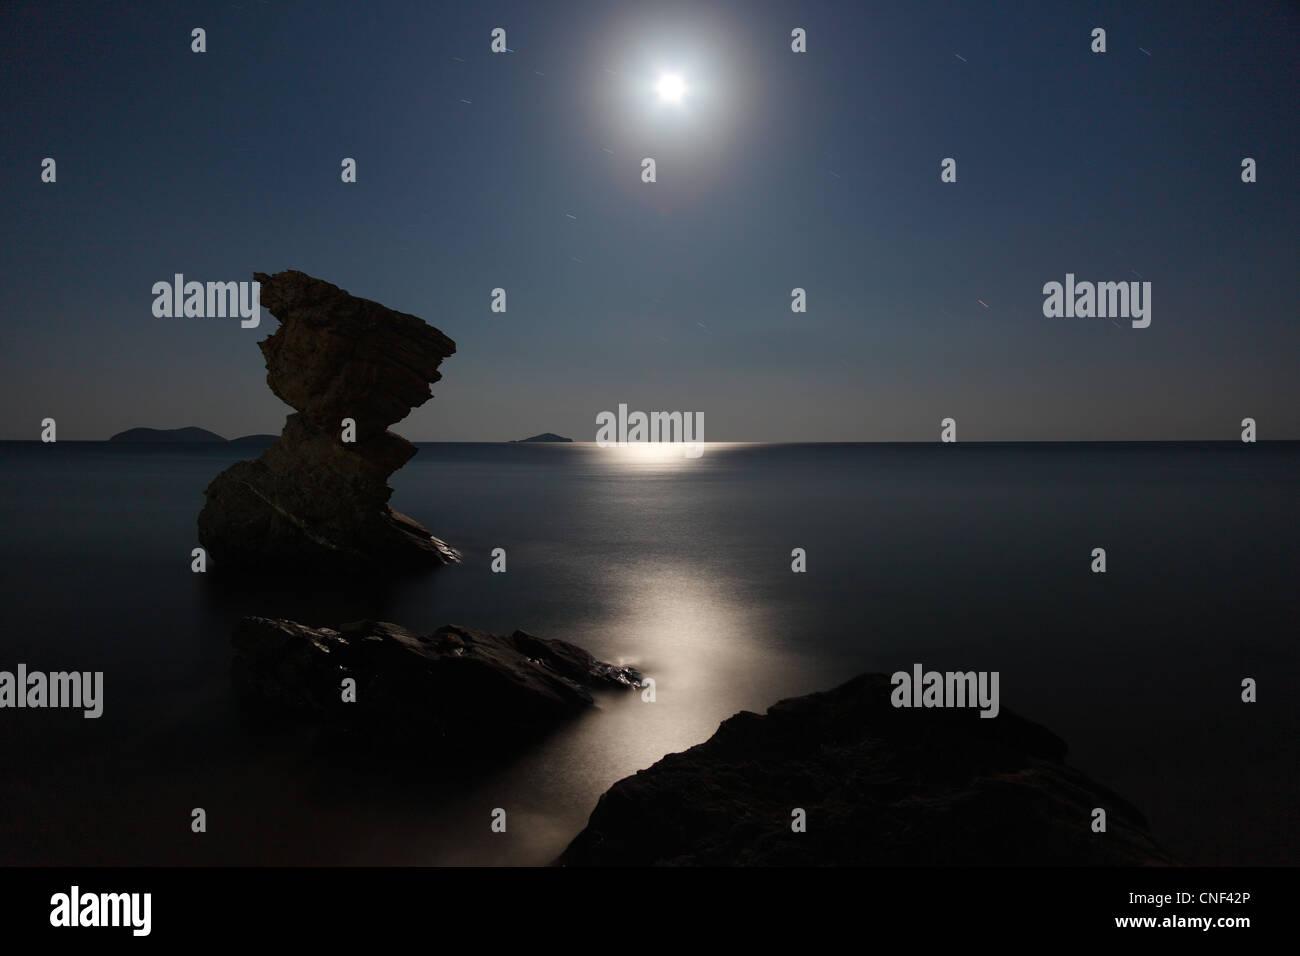 Aegean under moonlight at Andros island, Greece - Stock Image